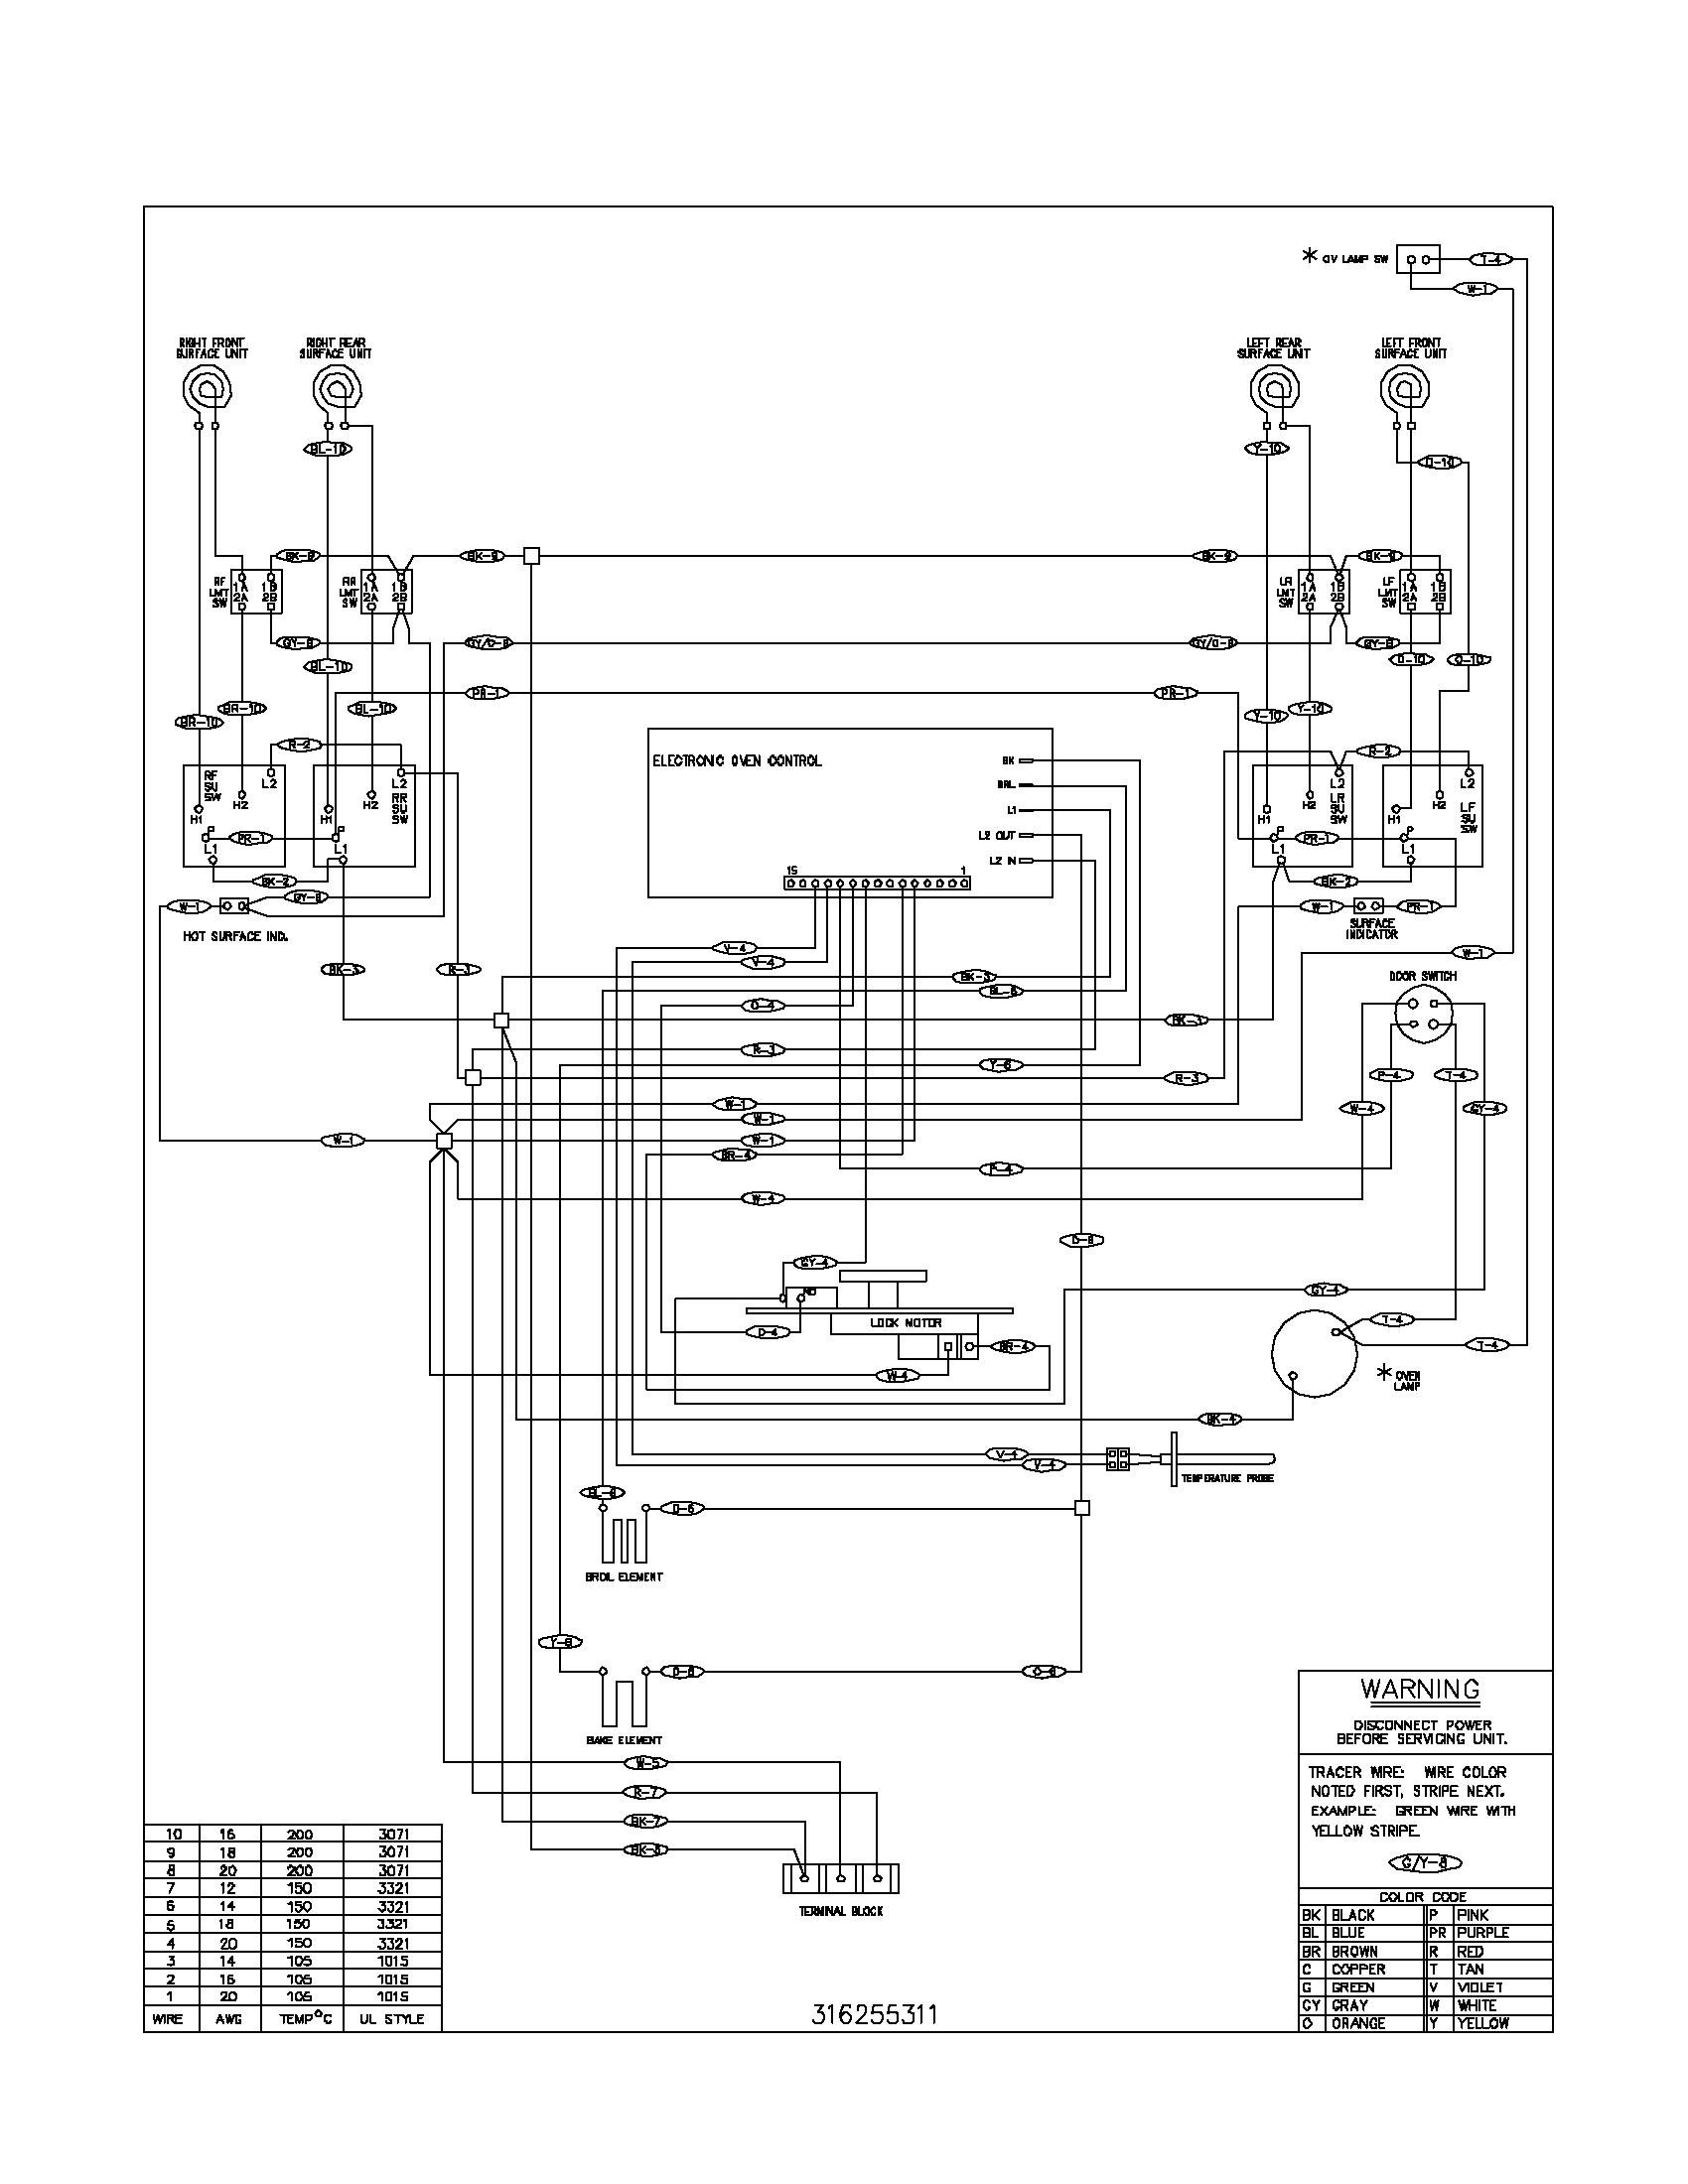 Sensational Frigidaire Stove Wiring Diagram Basic Electronics Wiring Diagram Wiring Digital Resources Anistprontobusorg